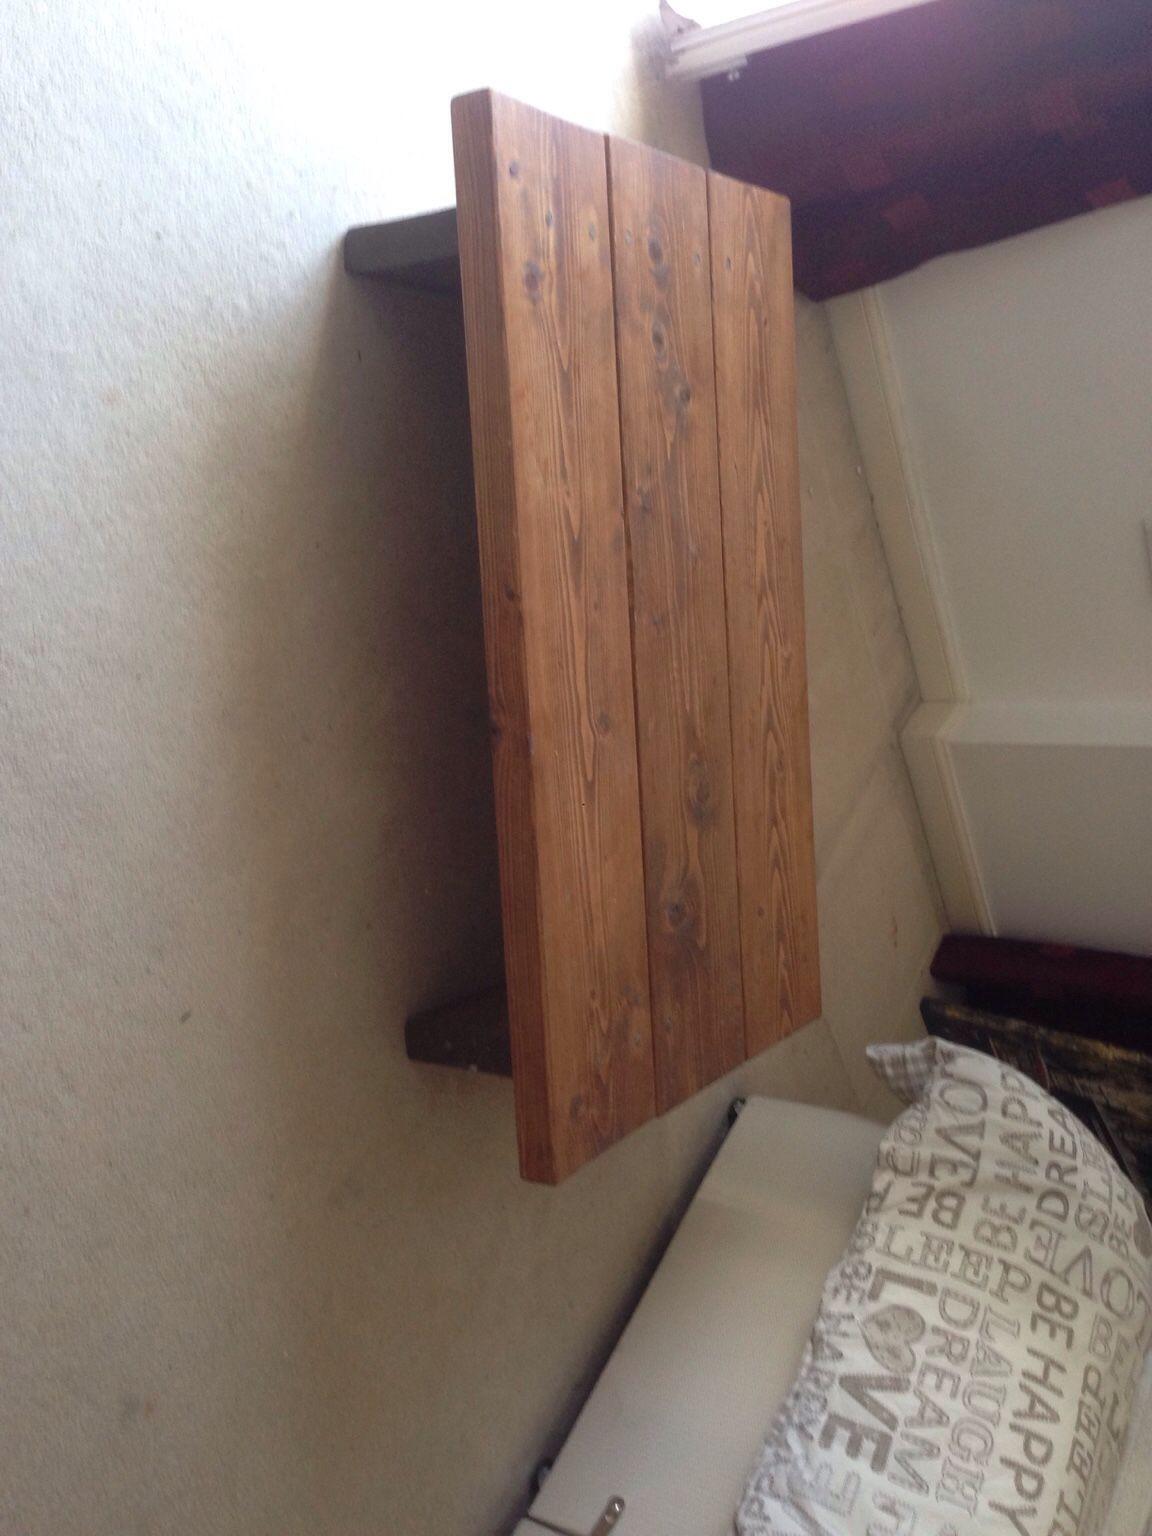 all hardwood flooring depot ltd pickering on of https en shpock com i w2qppkjffxh4q9vp 2018 08 08t102830 with regard to low solid wood coffee table 20